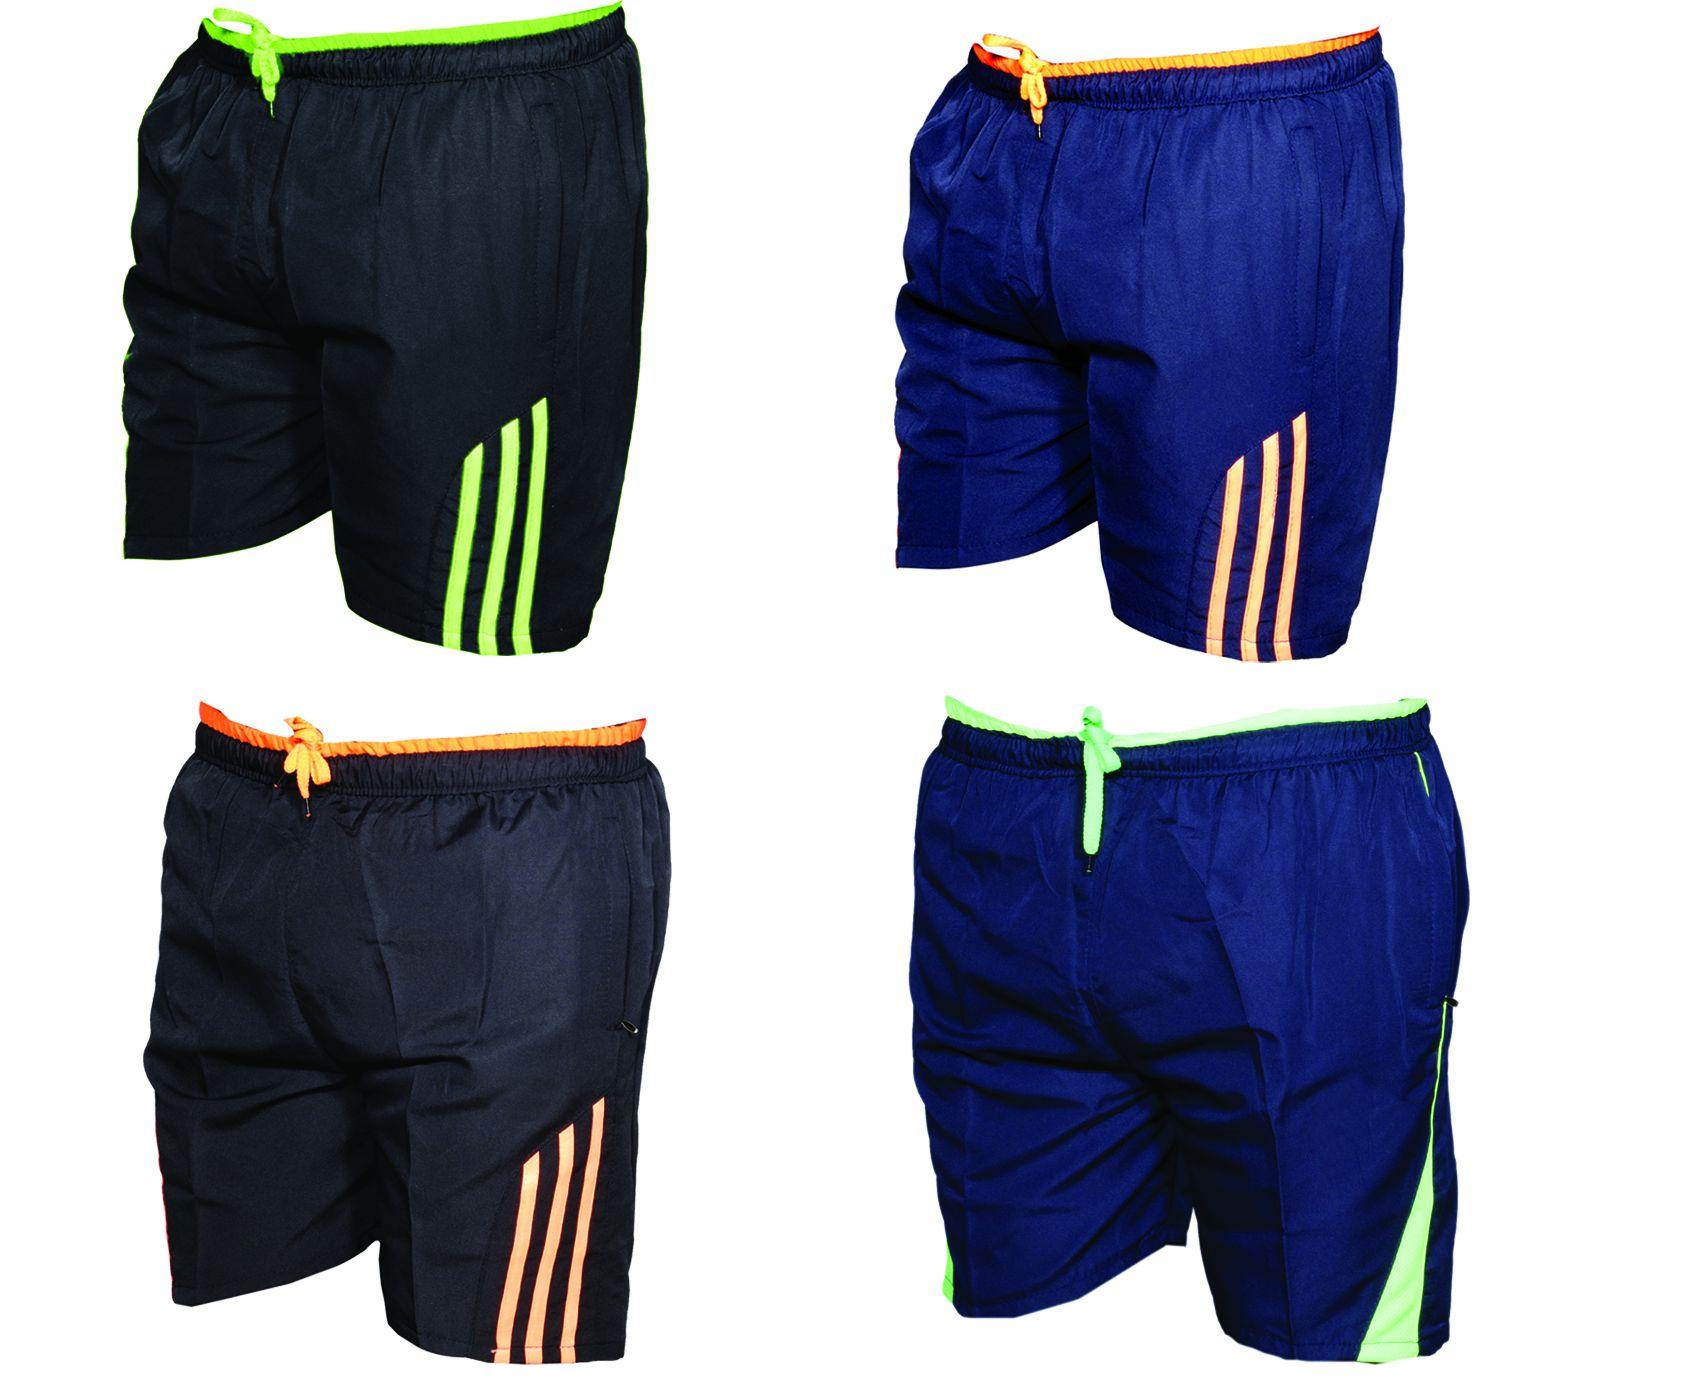 IndiWeaves Multi Shorts (Pack  of 4 Polyester Bermuda)